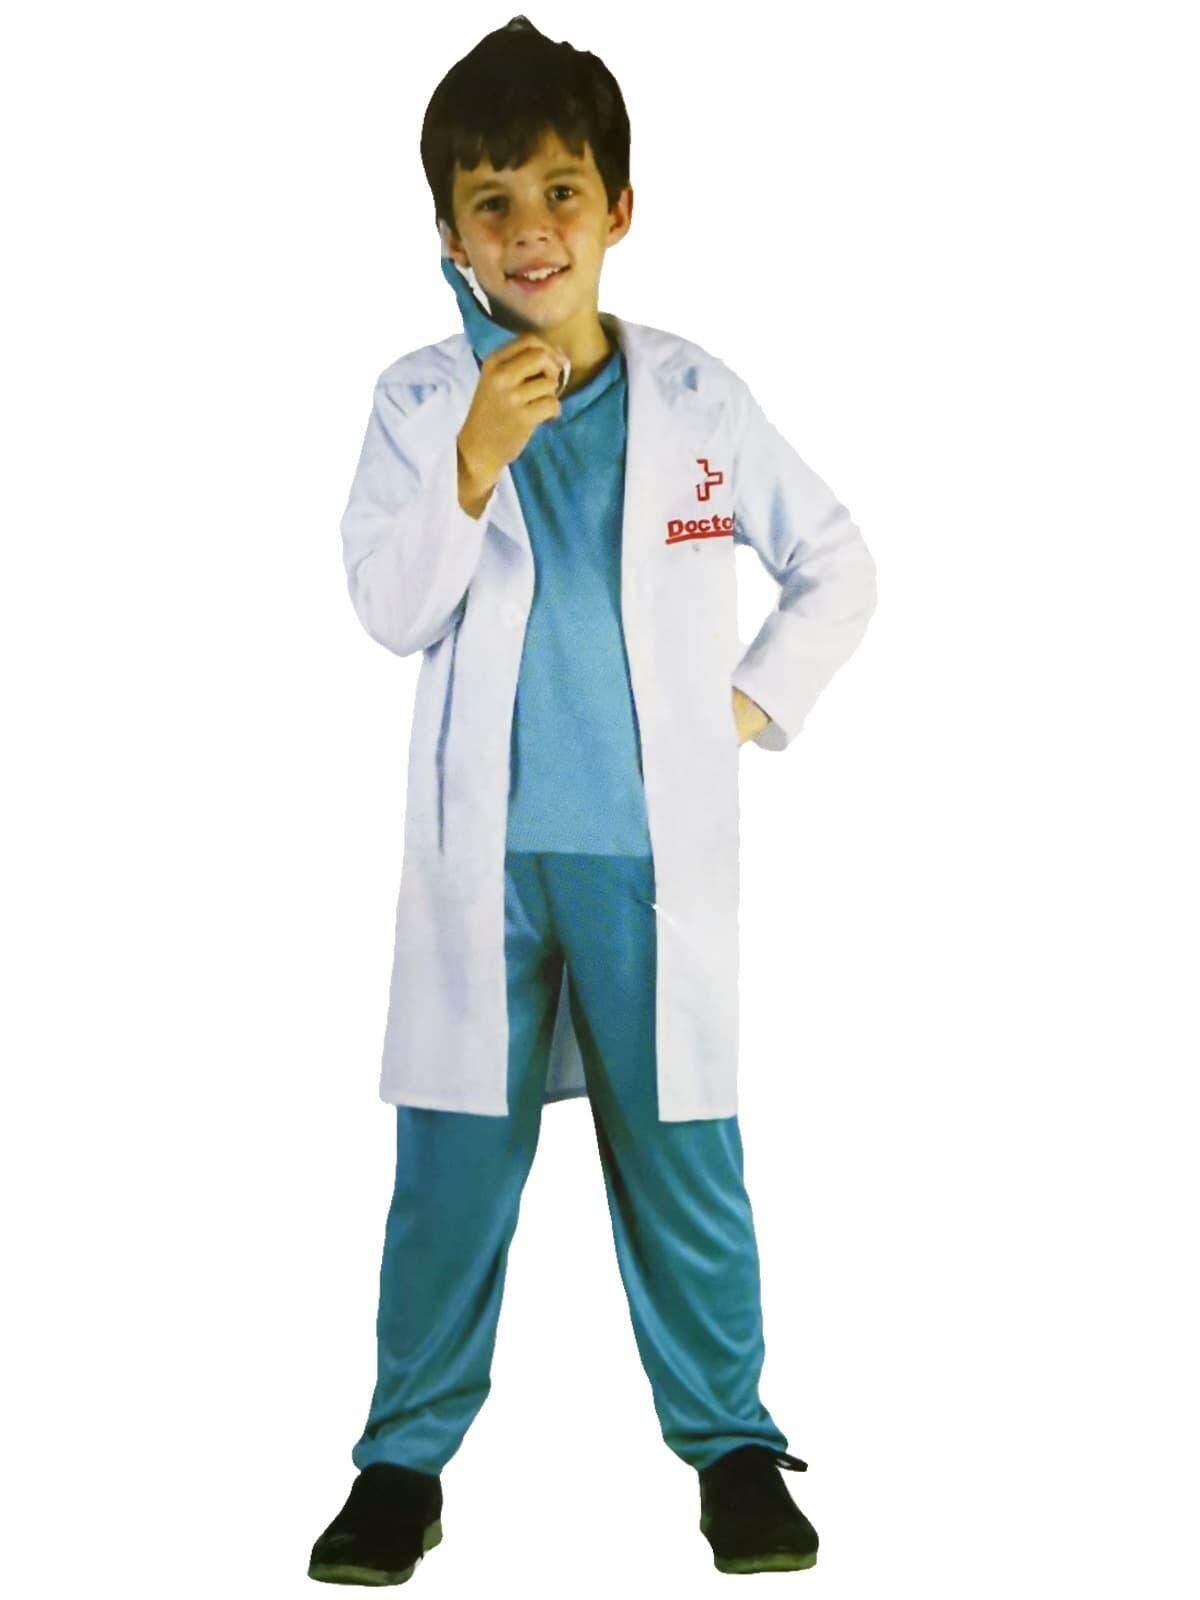 Costume Doctor - Boy toys for girls